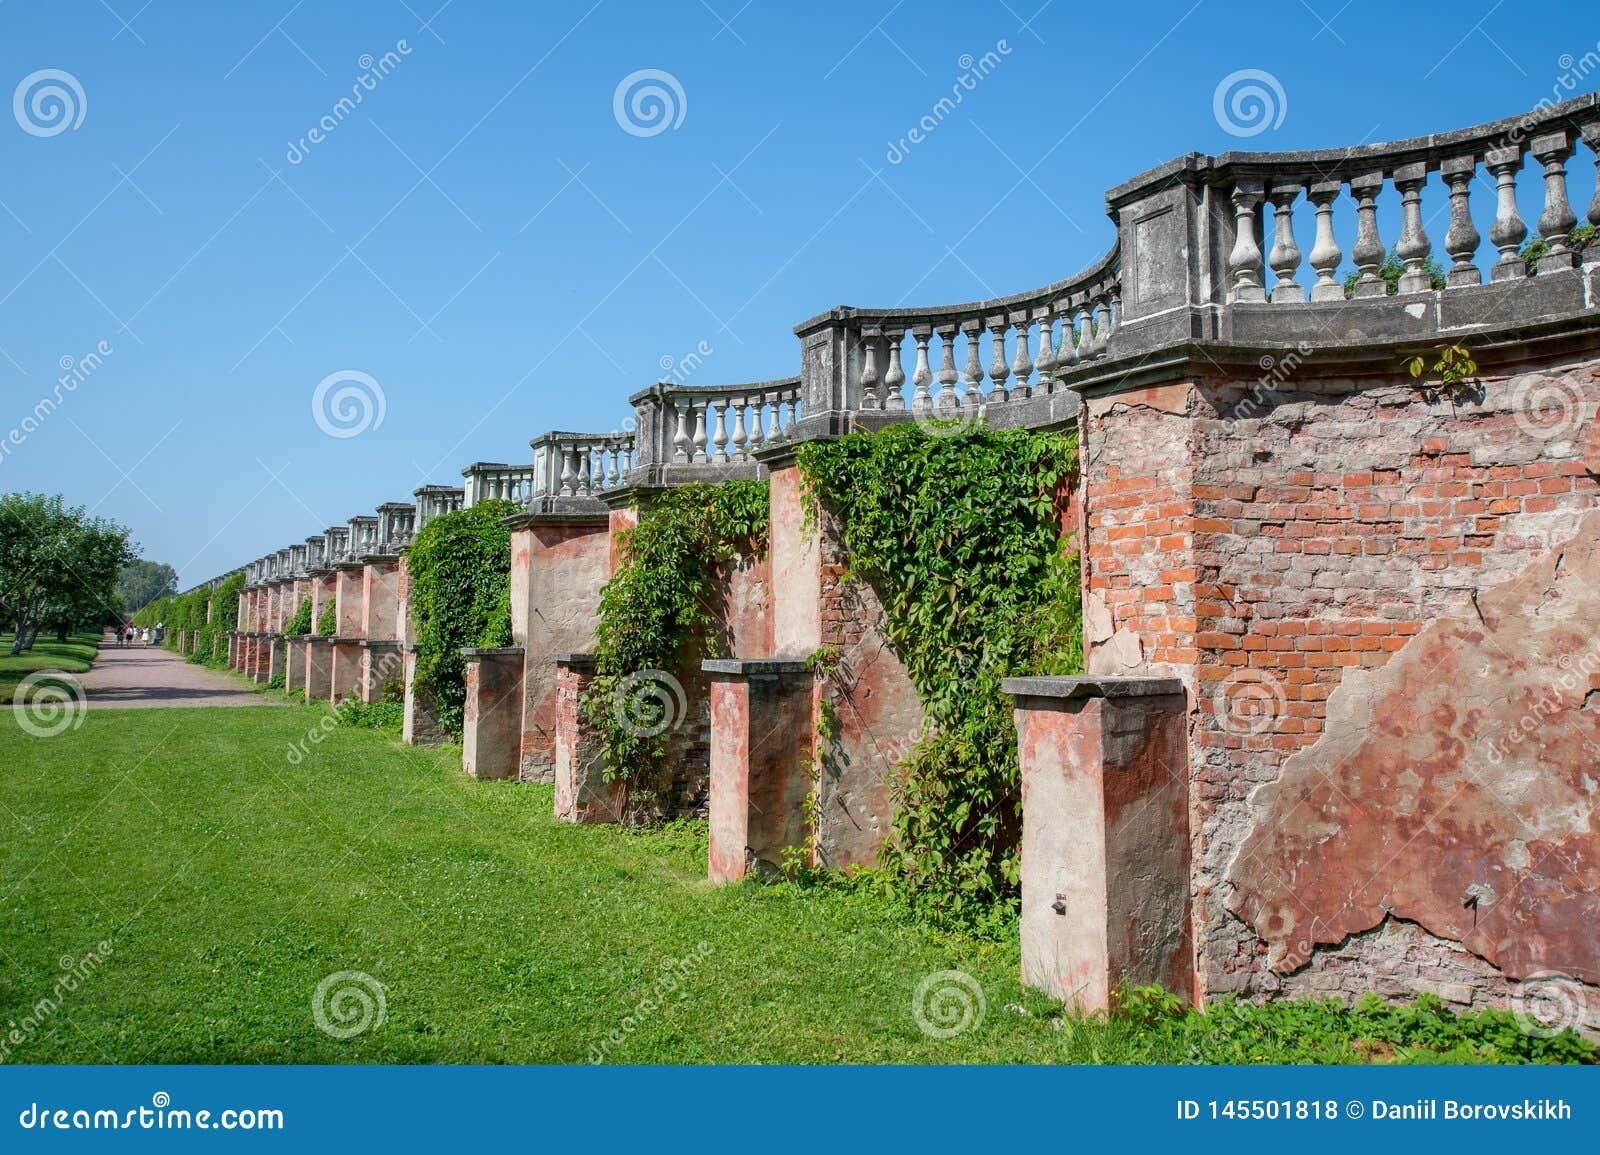 Brick wall overgrown wild grapes